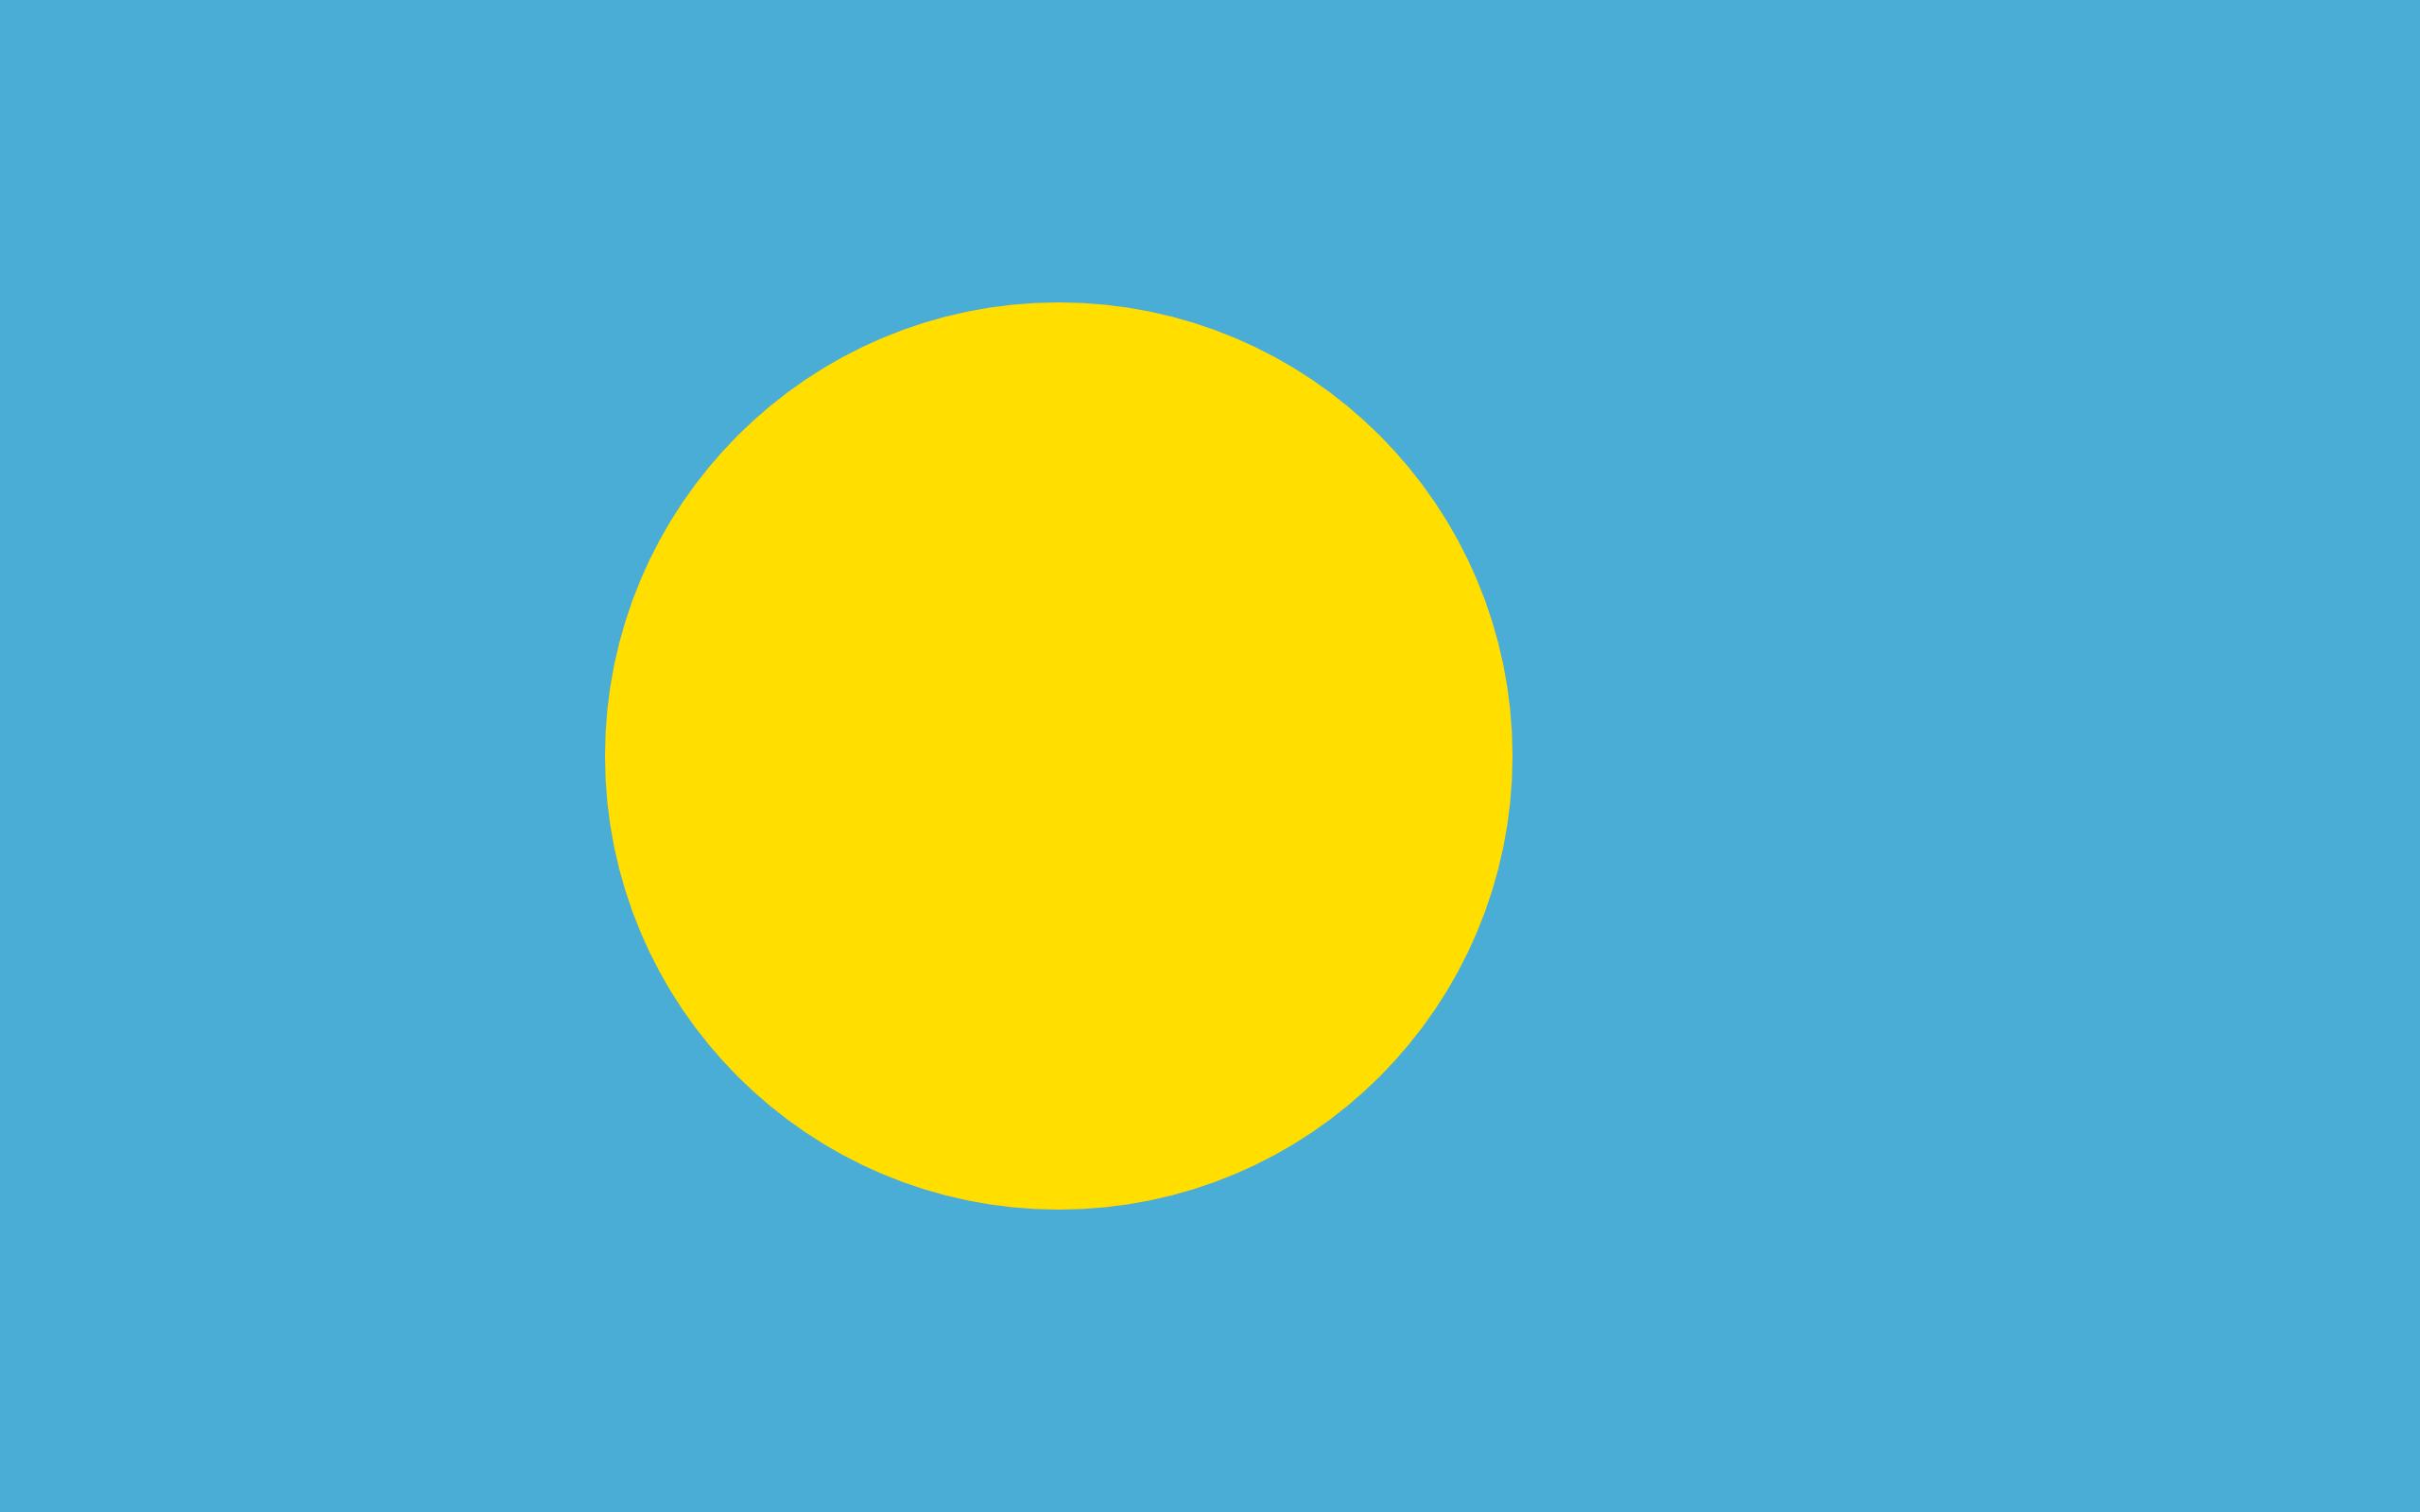 Palau, pays, emblème, logo, symbole - Fonds d'écran HD - Professor-falken.com